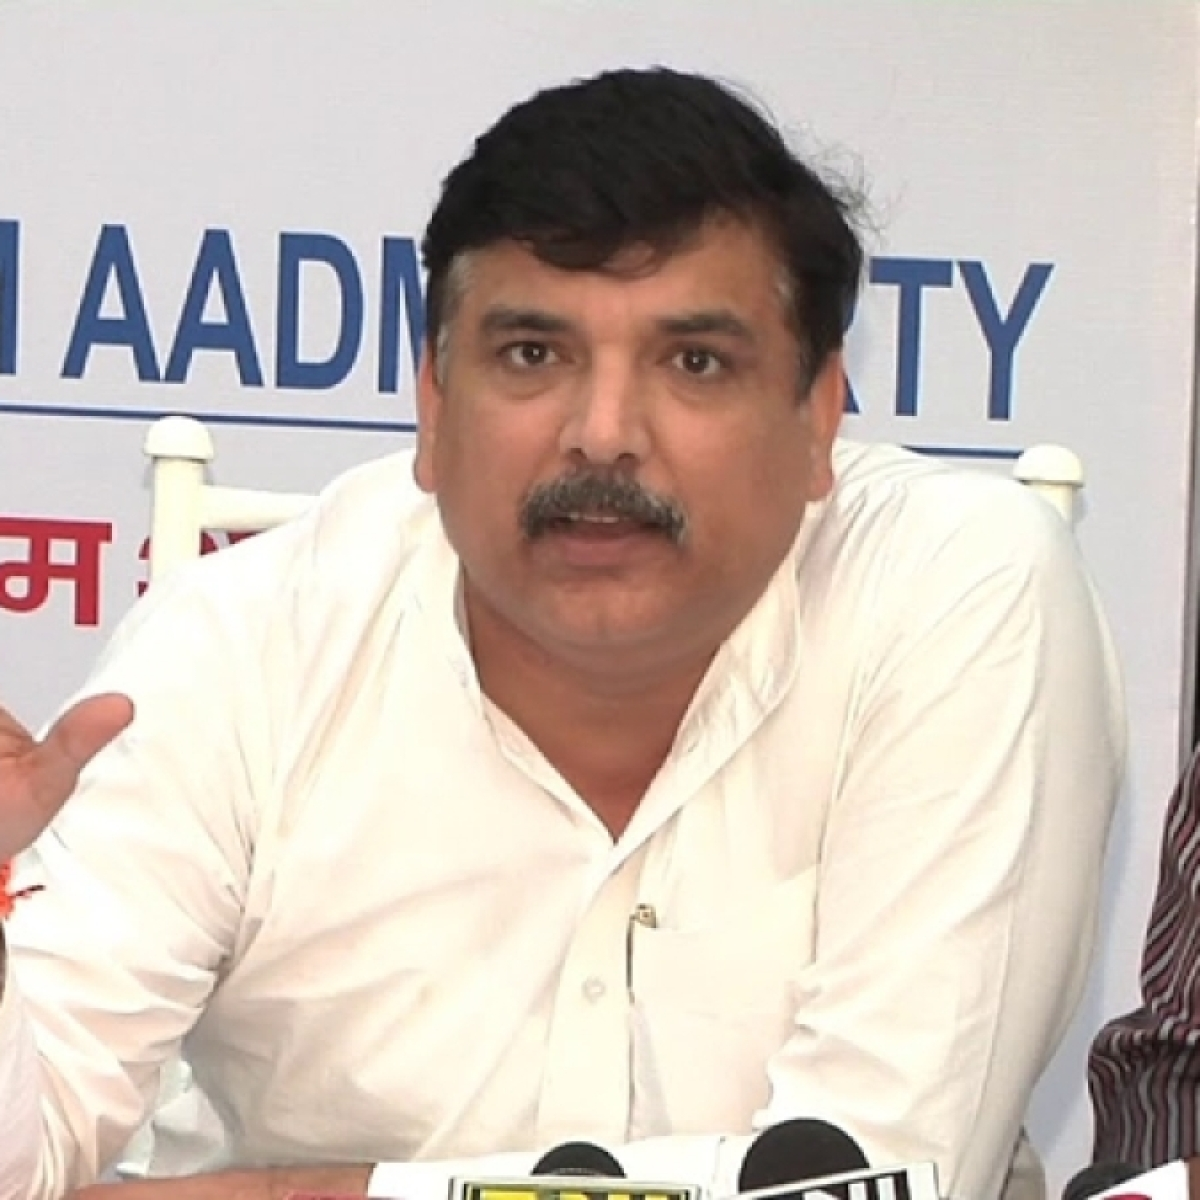 Remark on UP govt: AAP neta booked